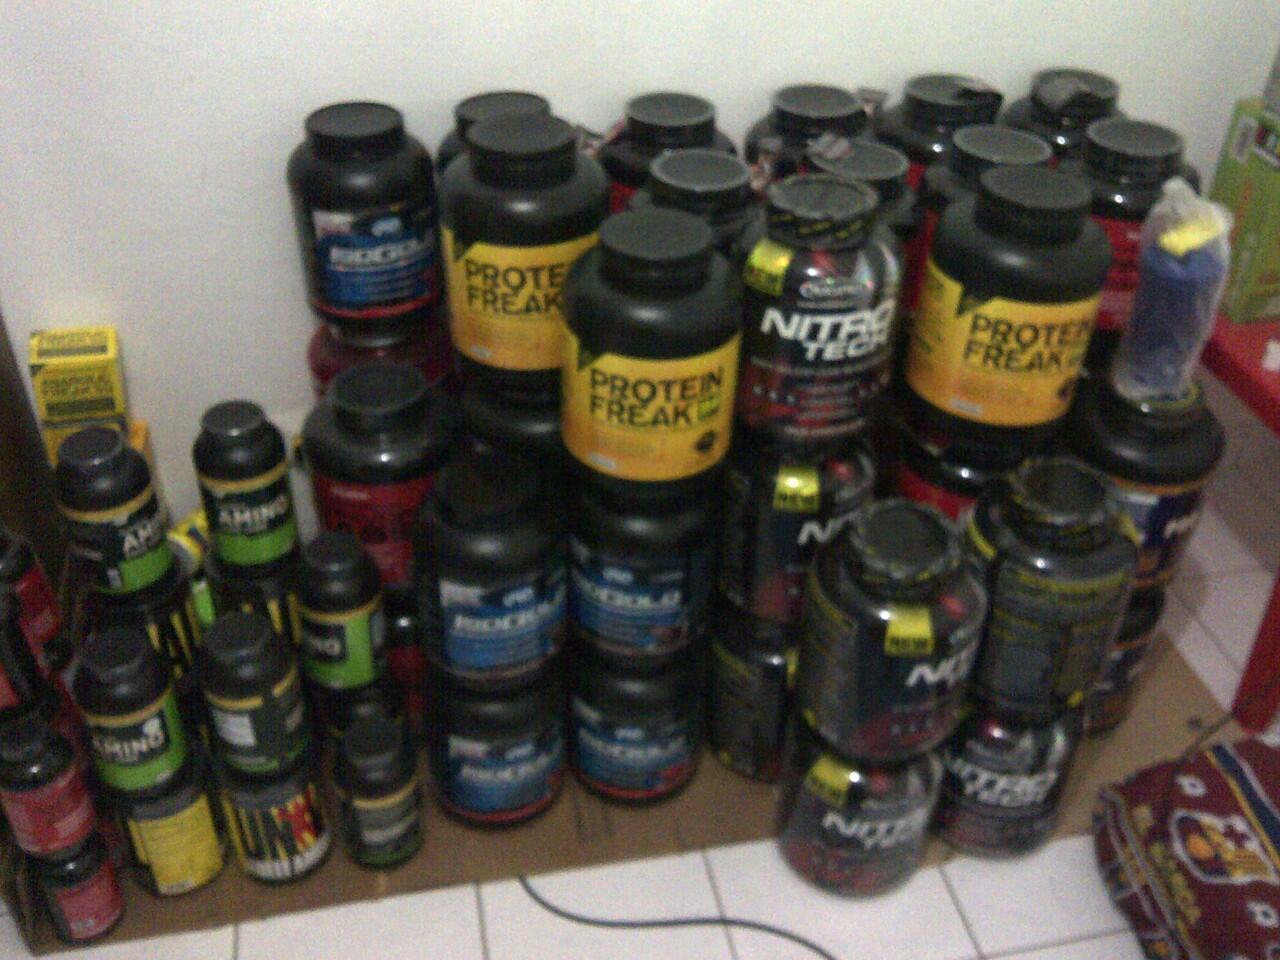 fitnes suplemen mayhem,hydroxycut,oxyelite,aminomax,jack3d,neurocore,bcaa,concret,